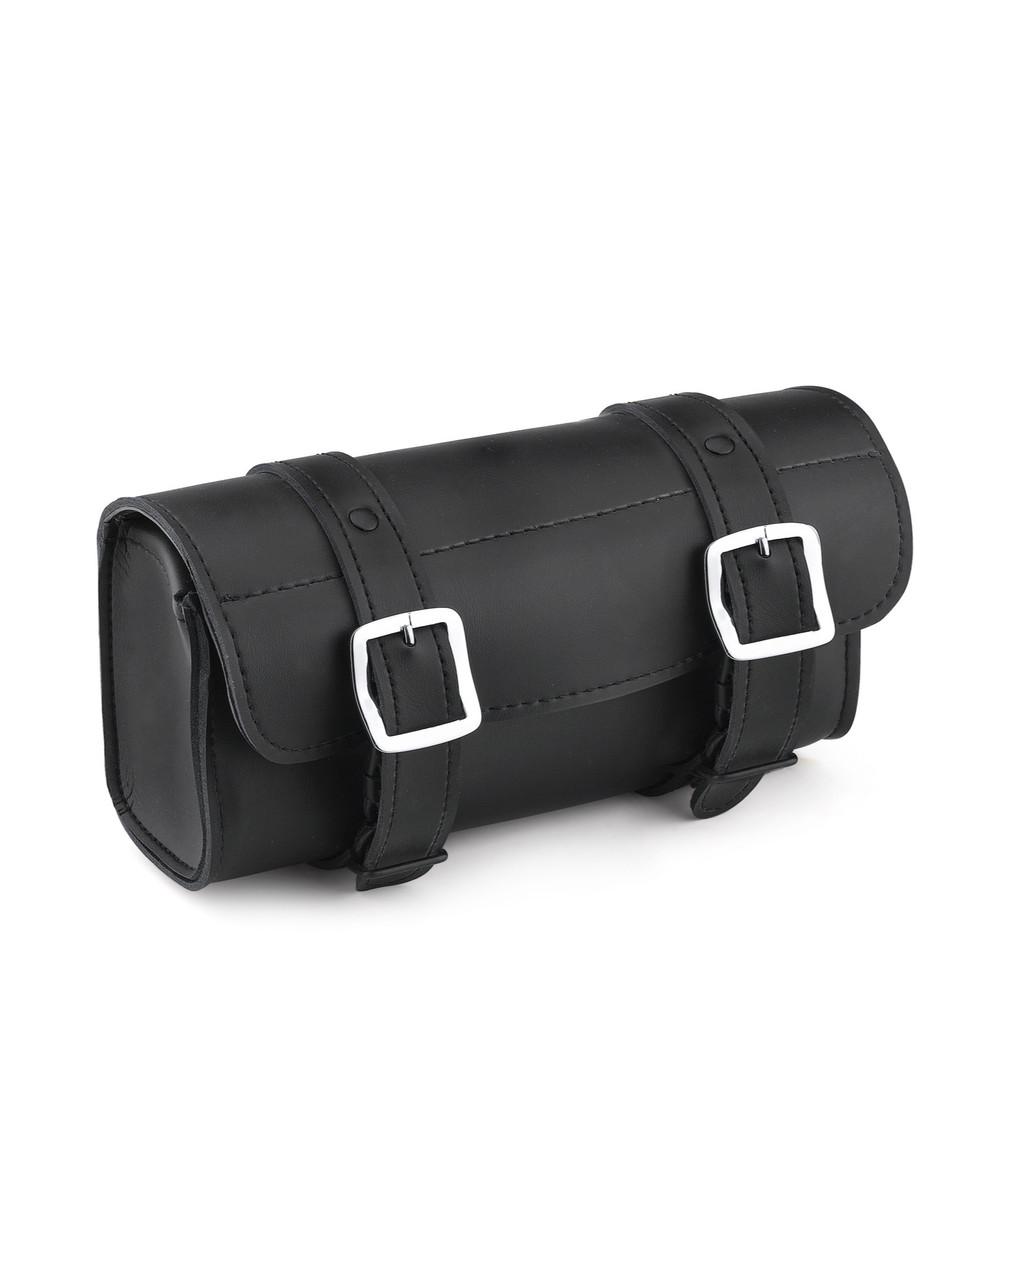 Victory Armor Plain Motorcycle Tool Bag Main Bag View